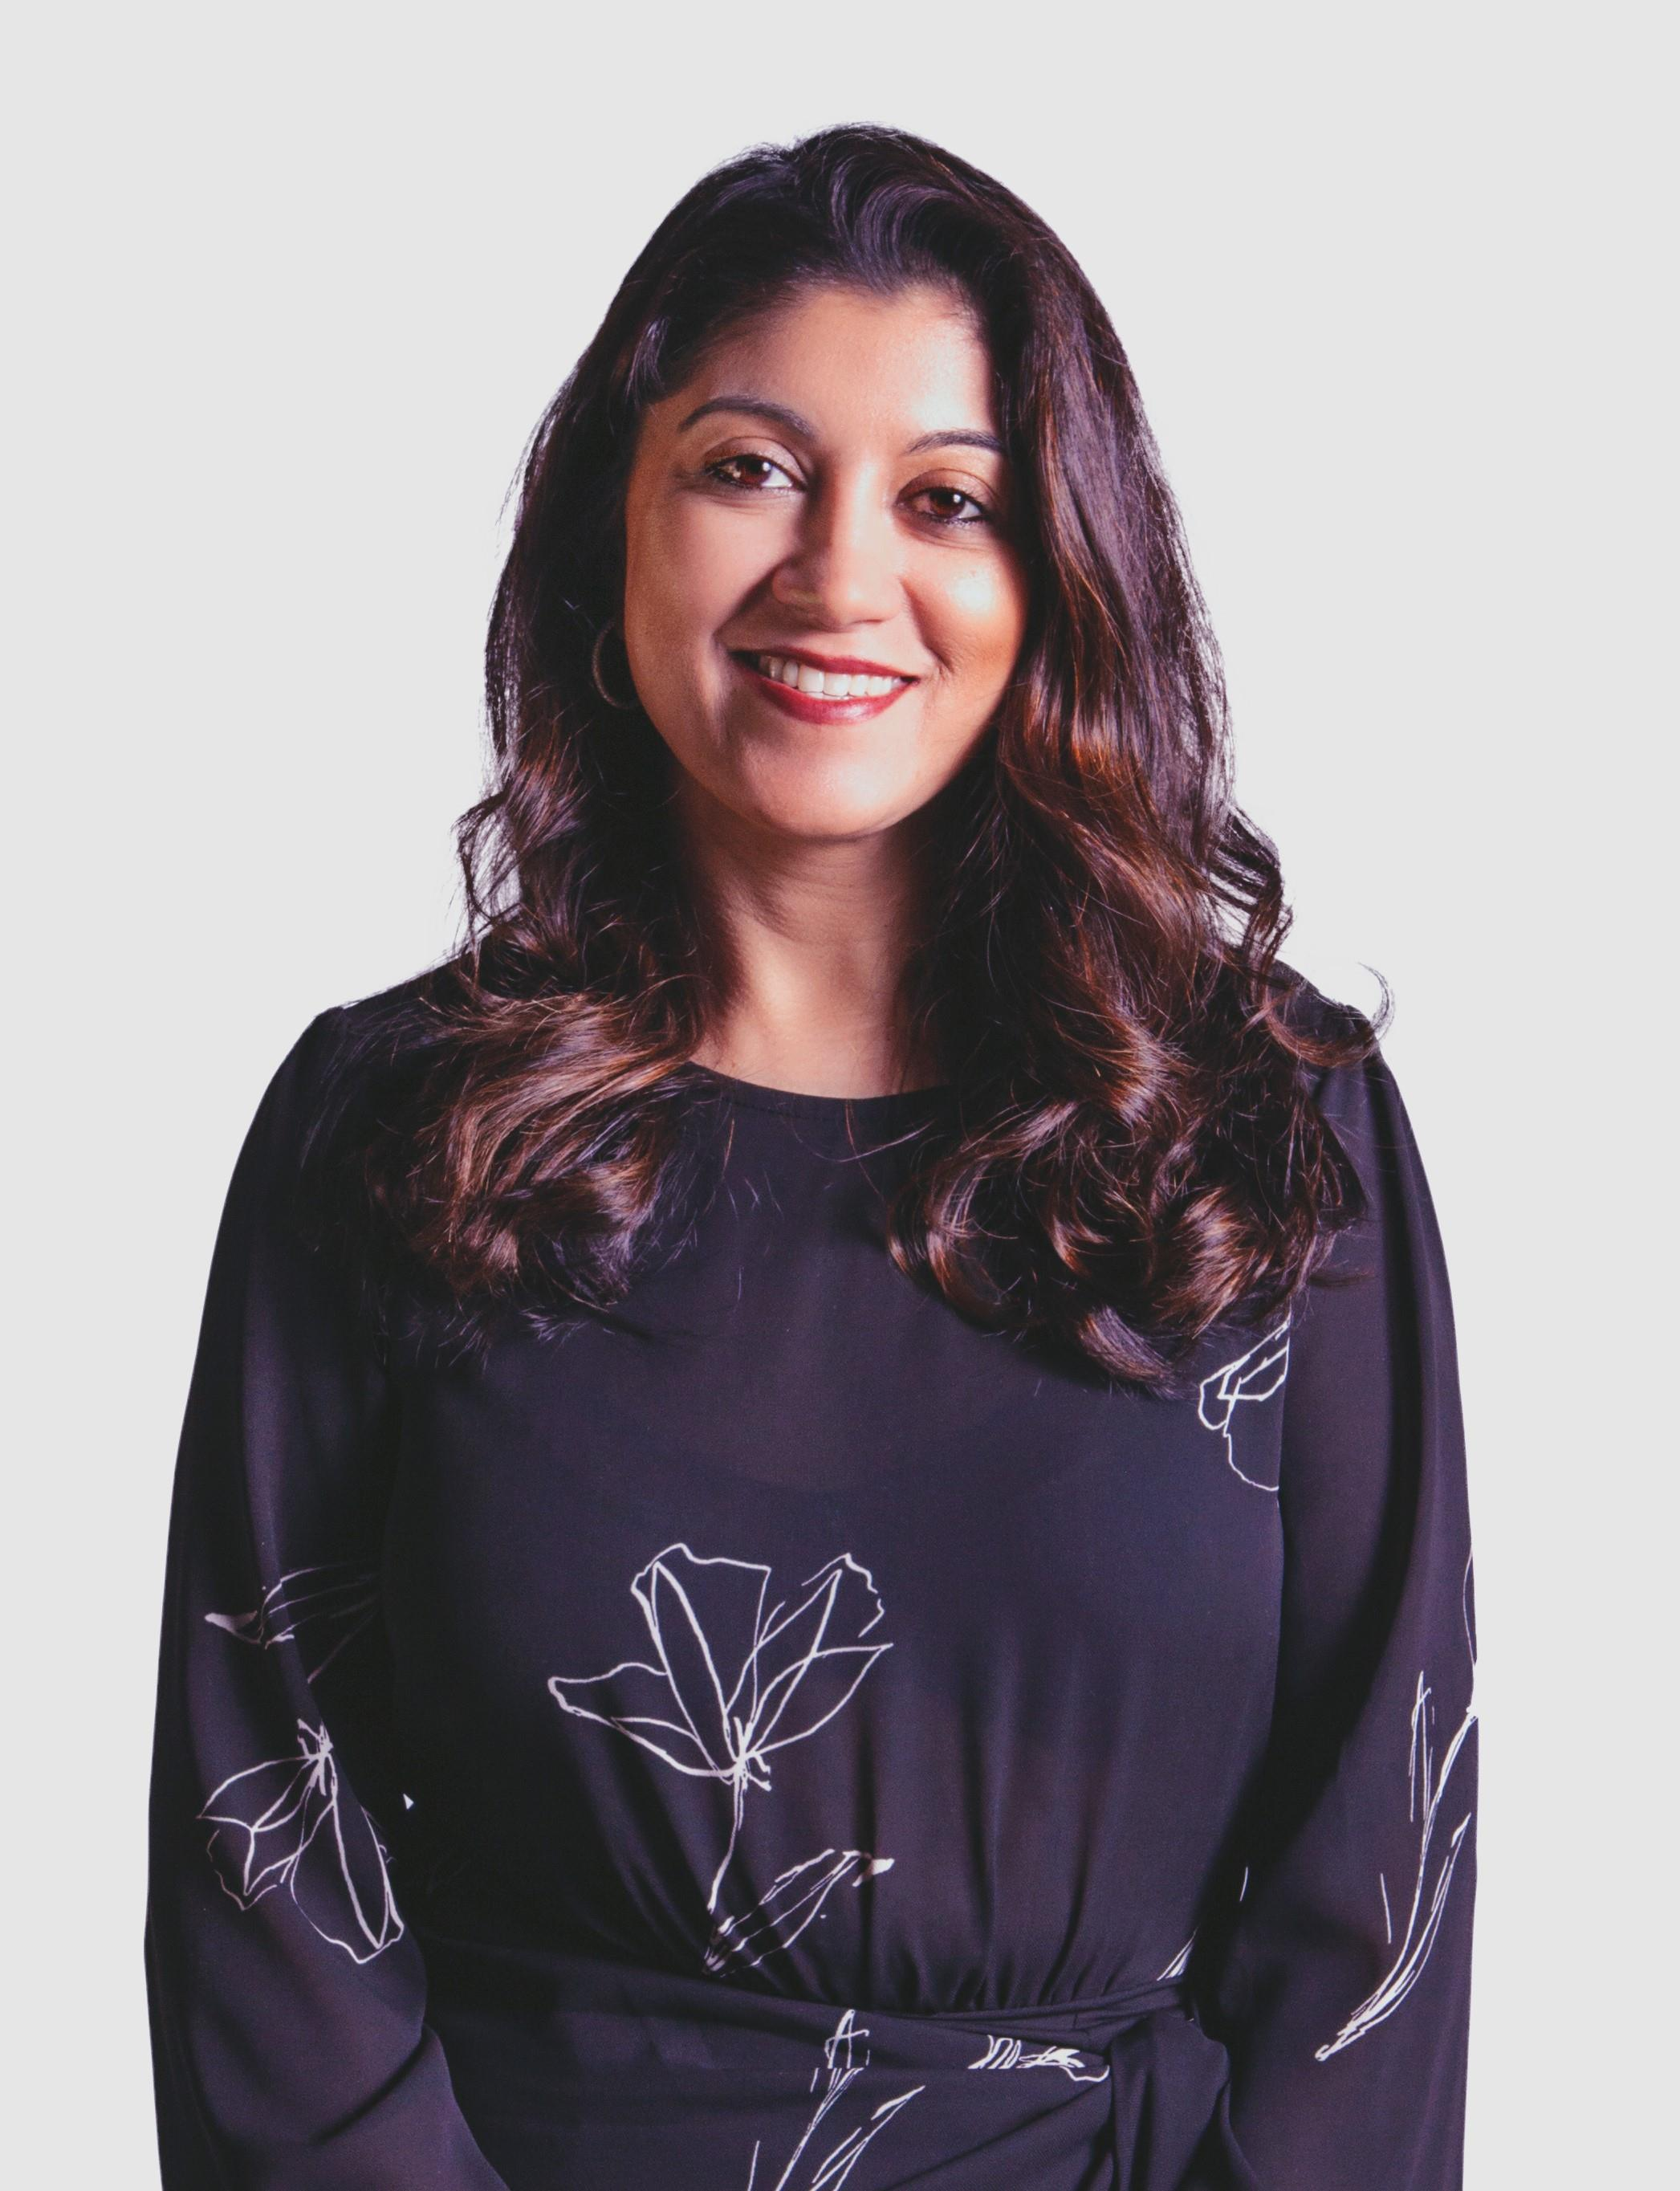 Jasmine Dadlani